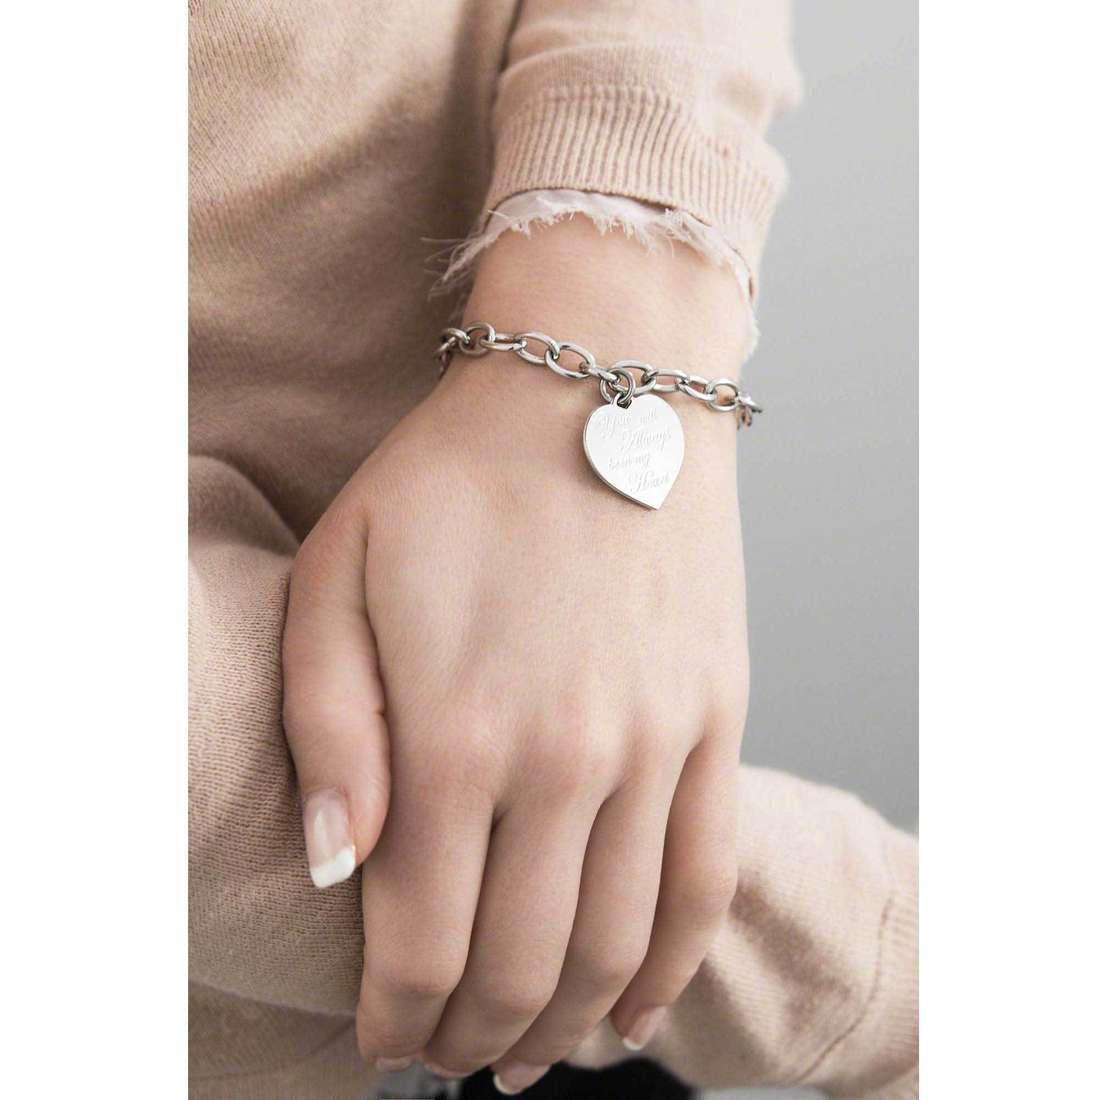 Nomination bracciali Sweetheart donna 026112/014 indosso